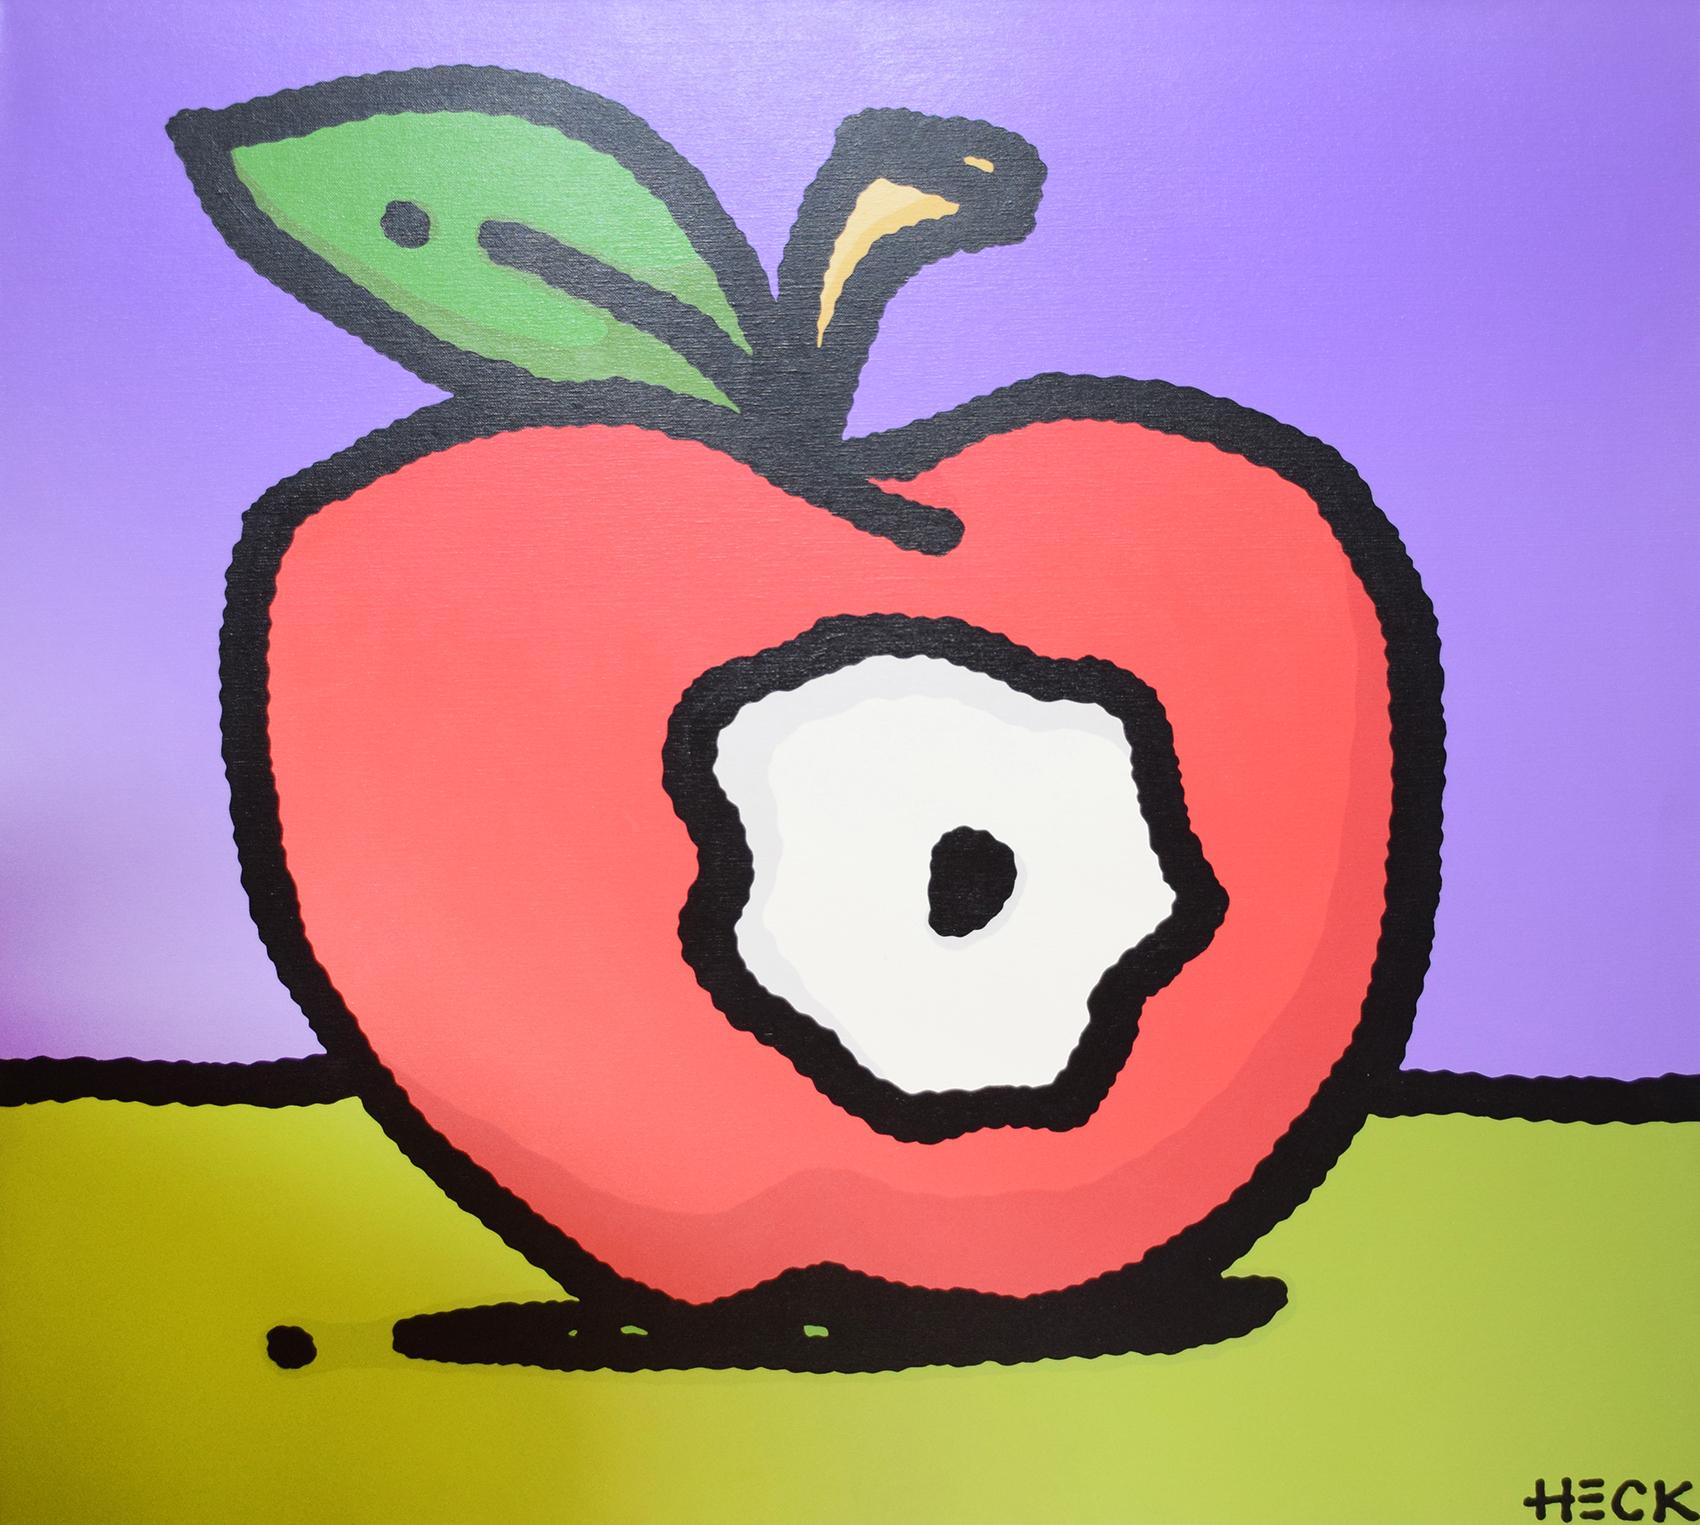 Ed Heck - Eye of my apple , 6575-006-183